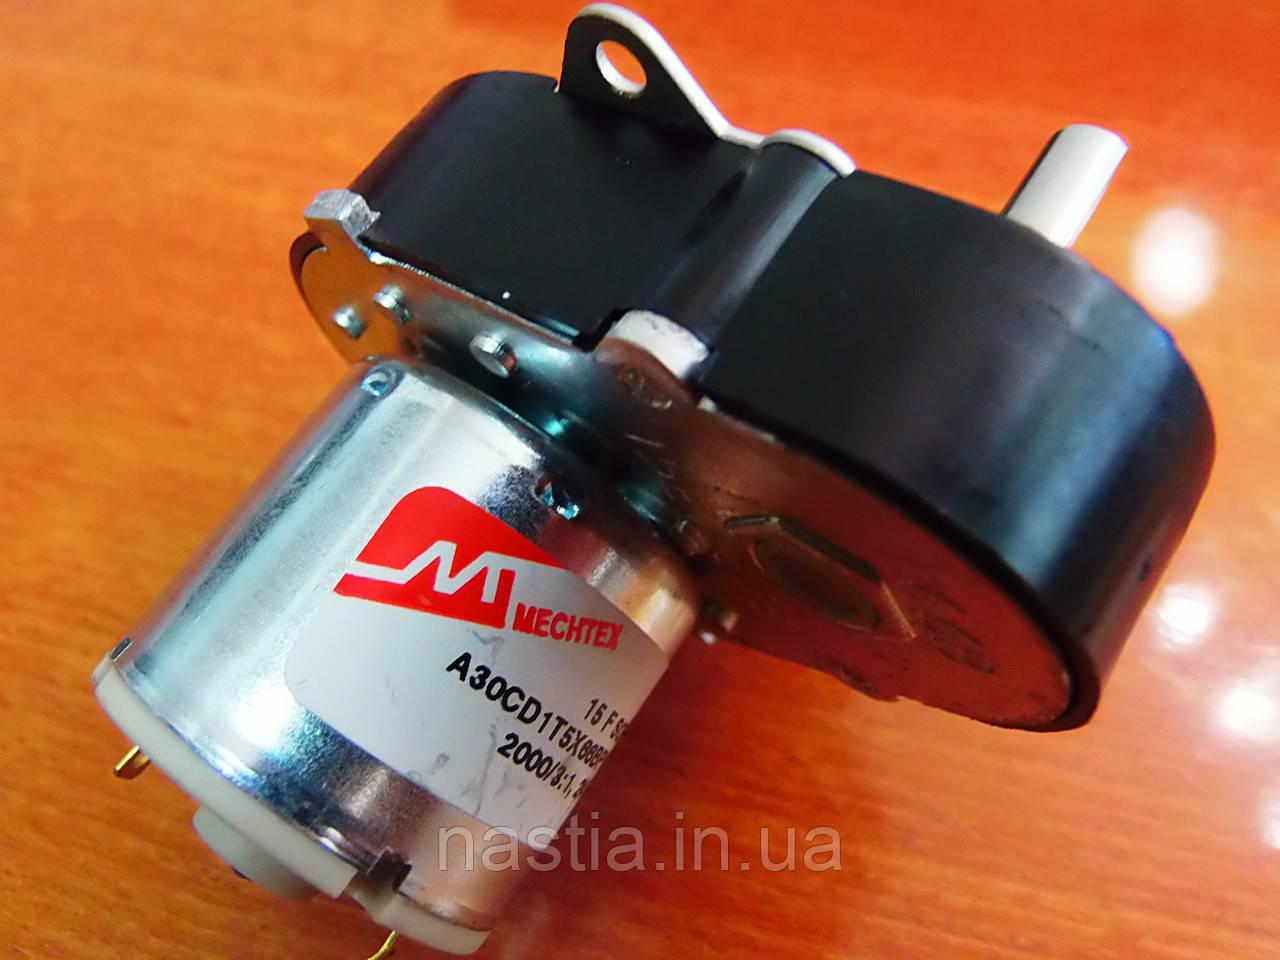 11033192 Моторедуктор